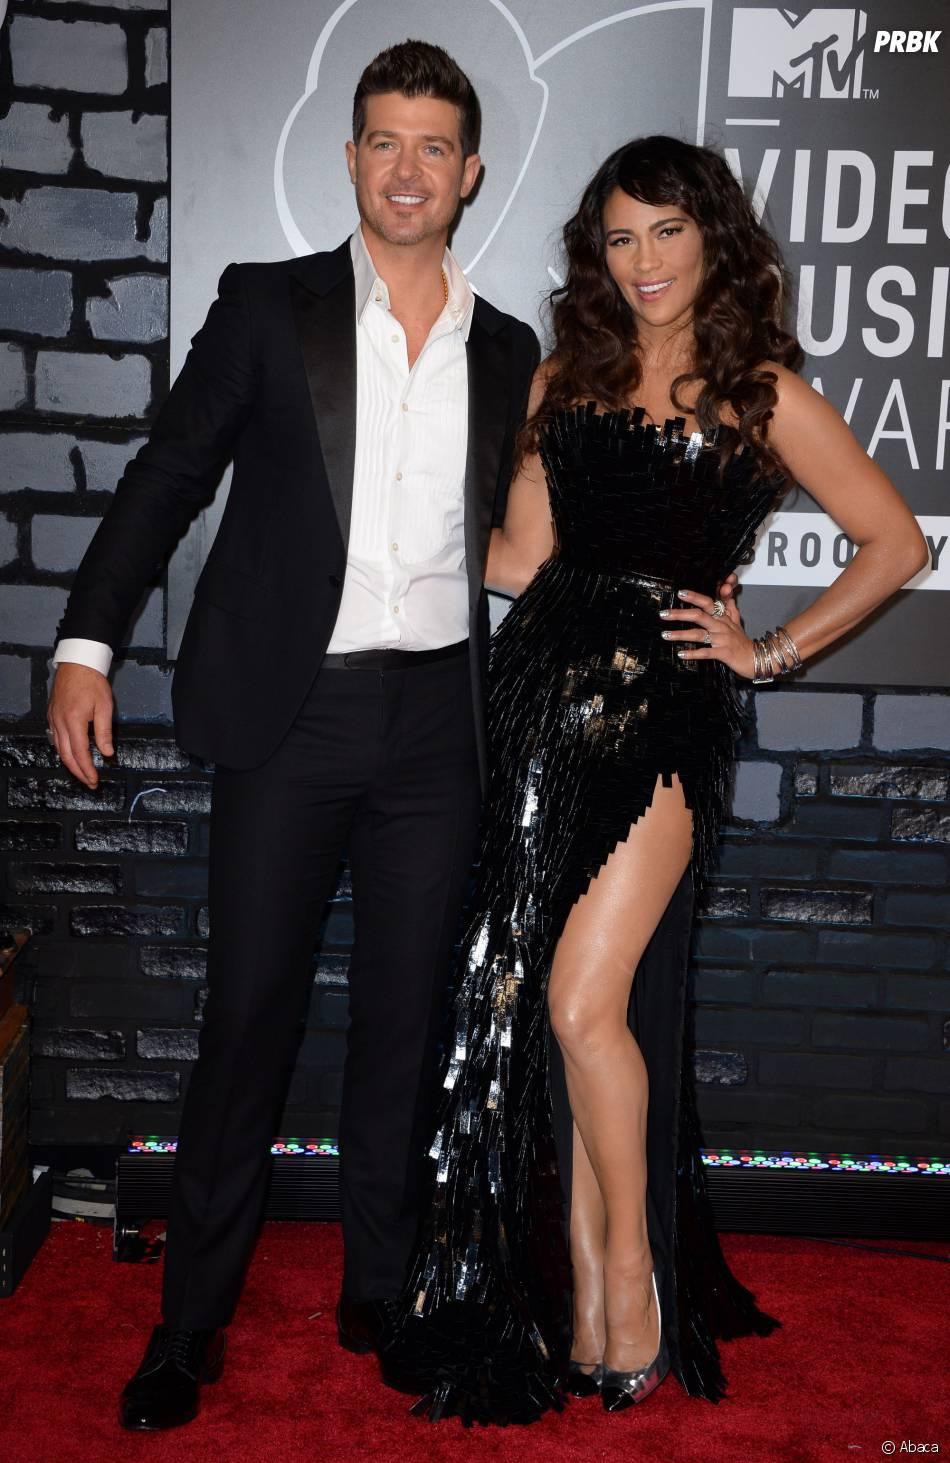 Robin Thicke et Paula Patton aux MTV Video Music Award 2013 le 25 aôut 2013